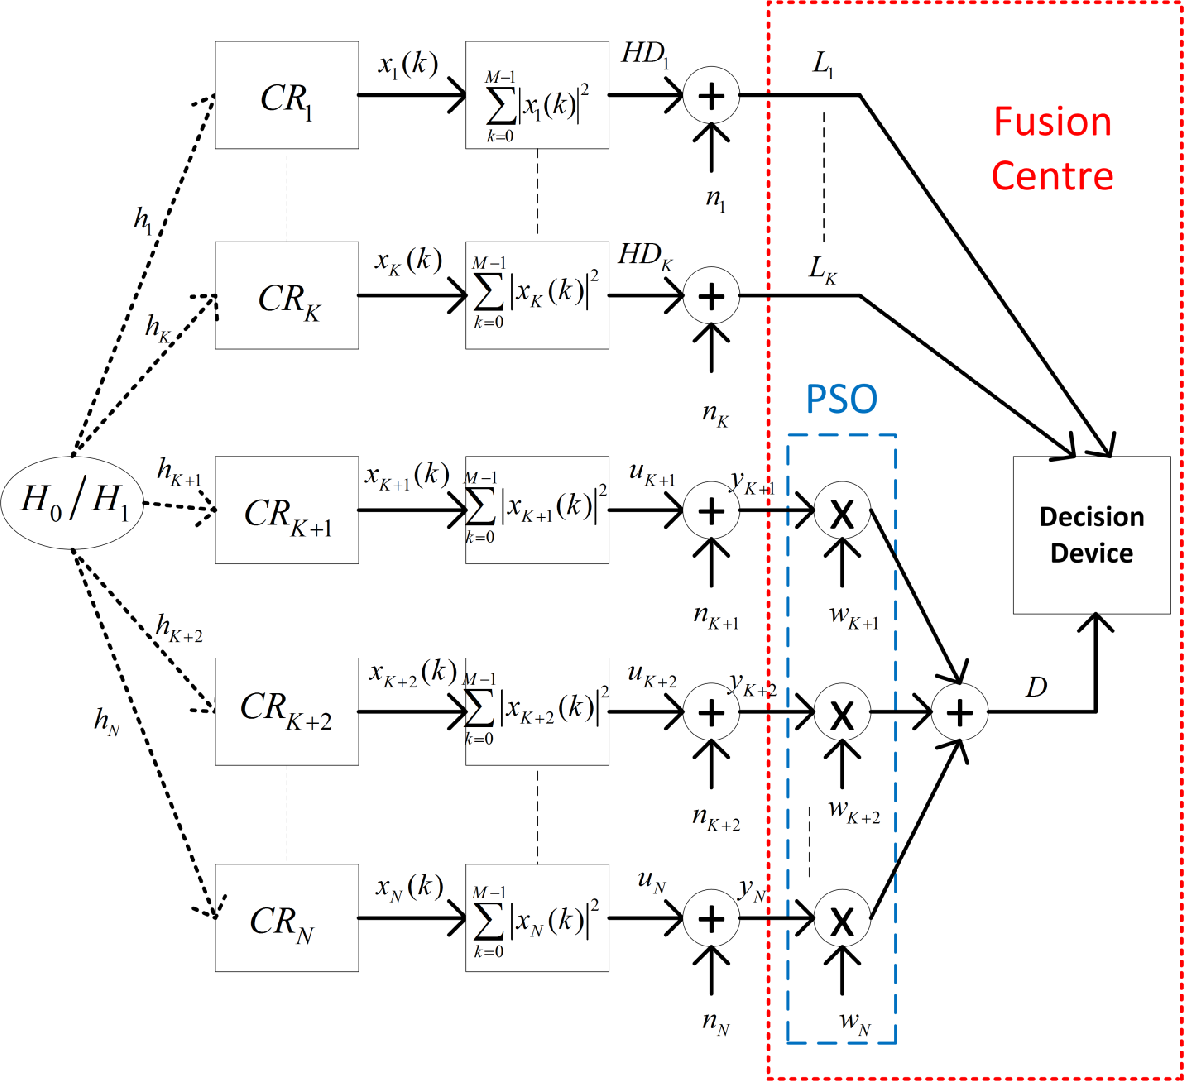 Figure 5. Framework for the proposed Hybrid PSO-OR algorithm